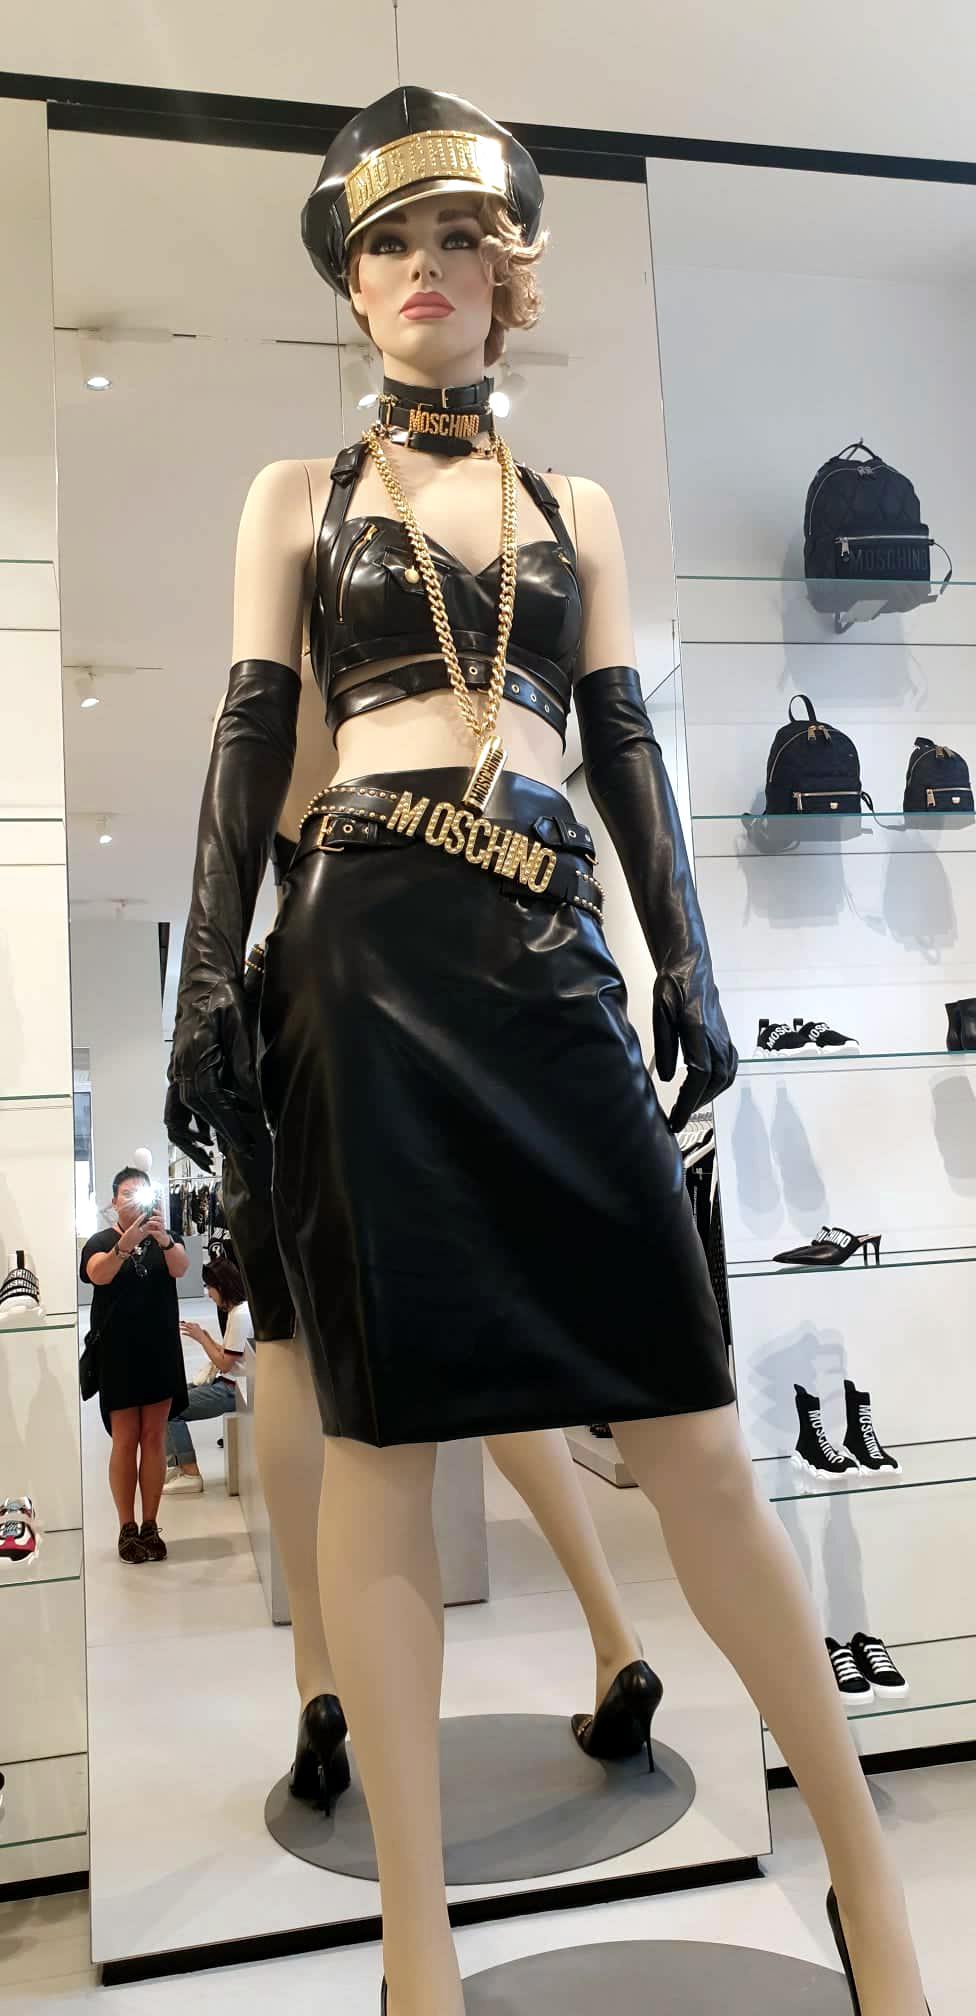 Fashion Week, Modemetropole, Mailand, Milano, Fashion, Trends, Looks, Designer, Fashion Vibes, Laufsteg, Runway Show, Heidi vom Lande, Fashionblogger, Love Moschino